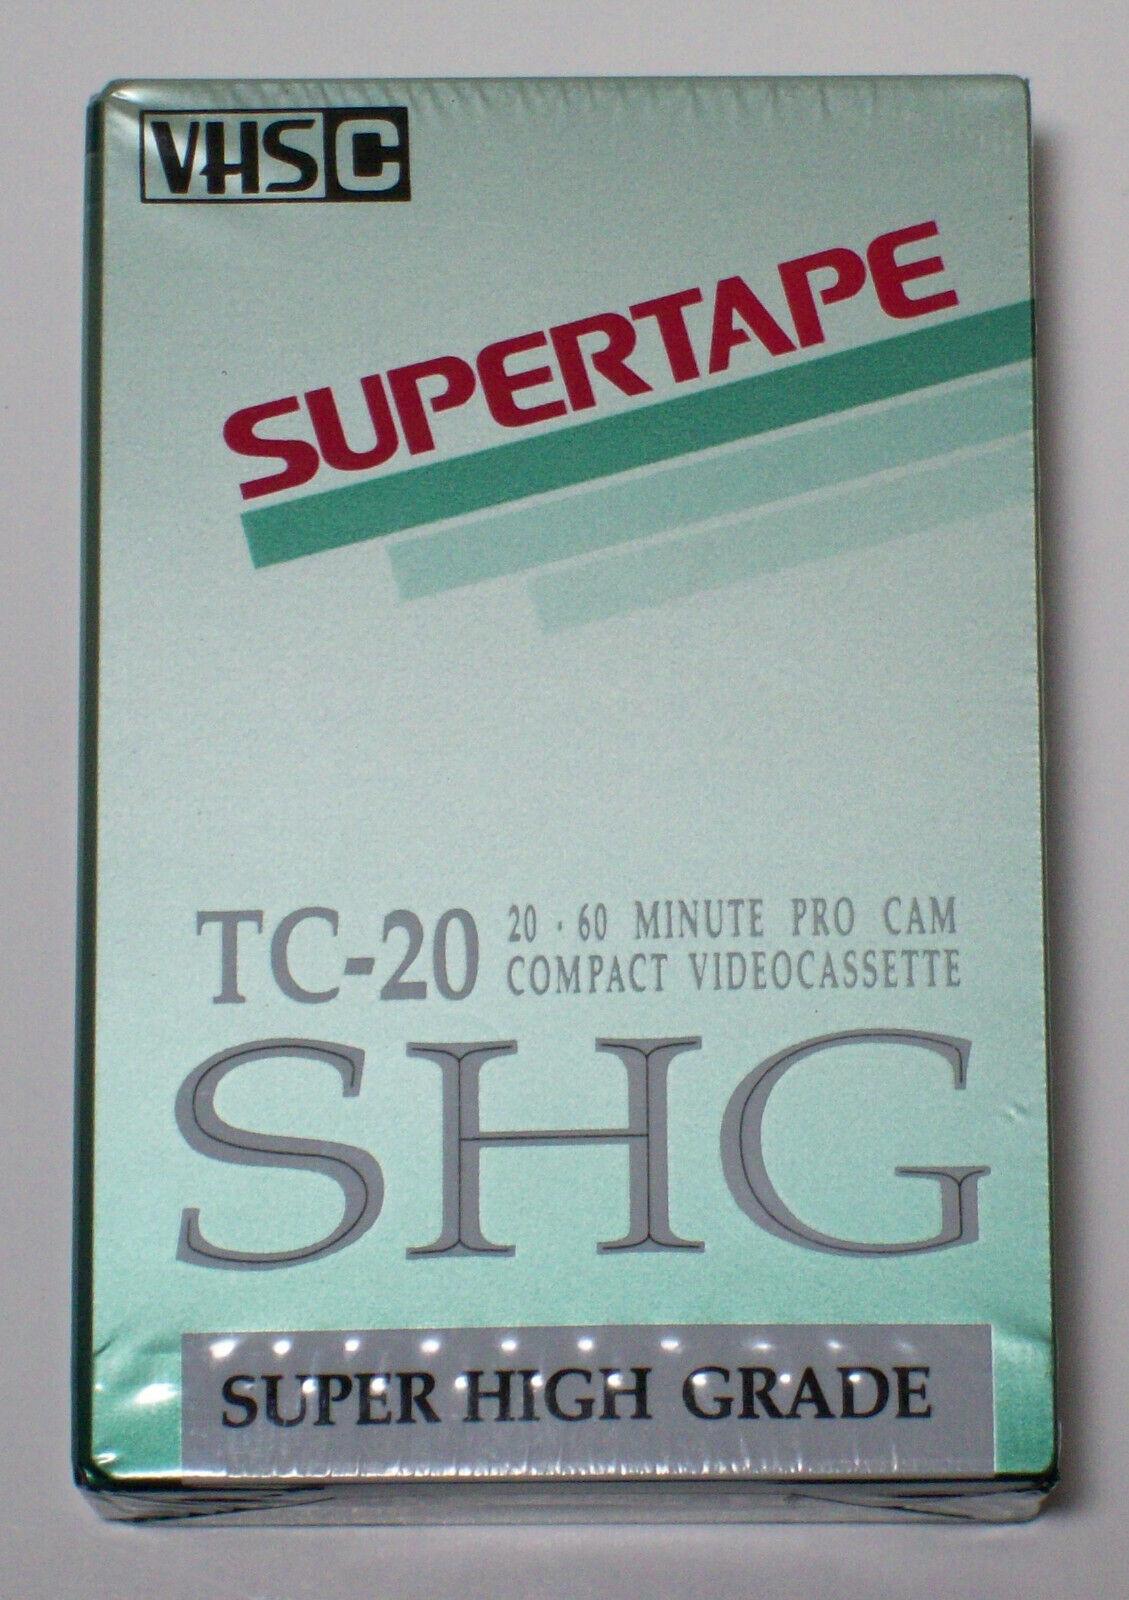 Radio Shack Blank VHSC TC-20 Supertape SHG Super High Grade Tandy Japan Sealed